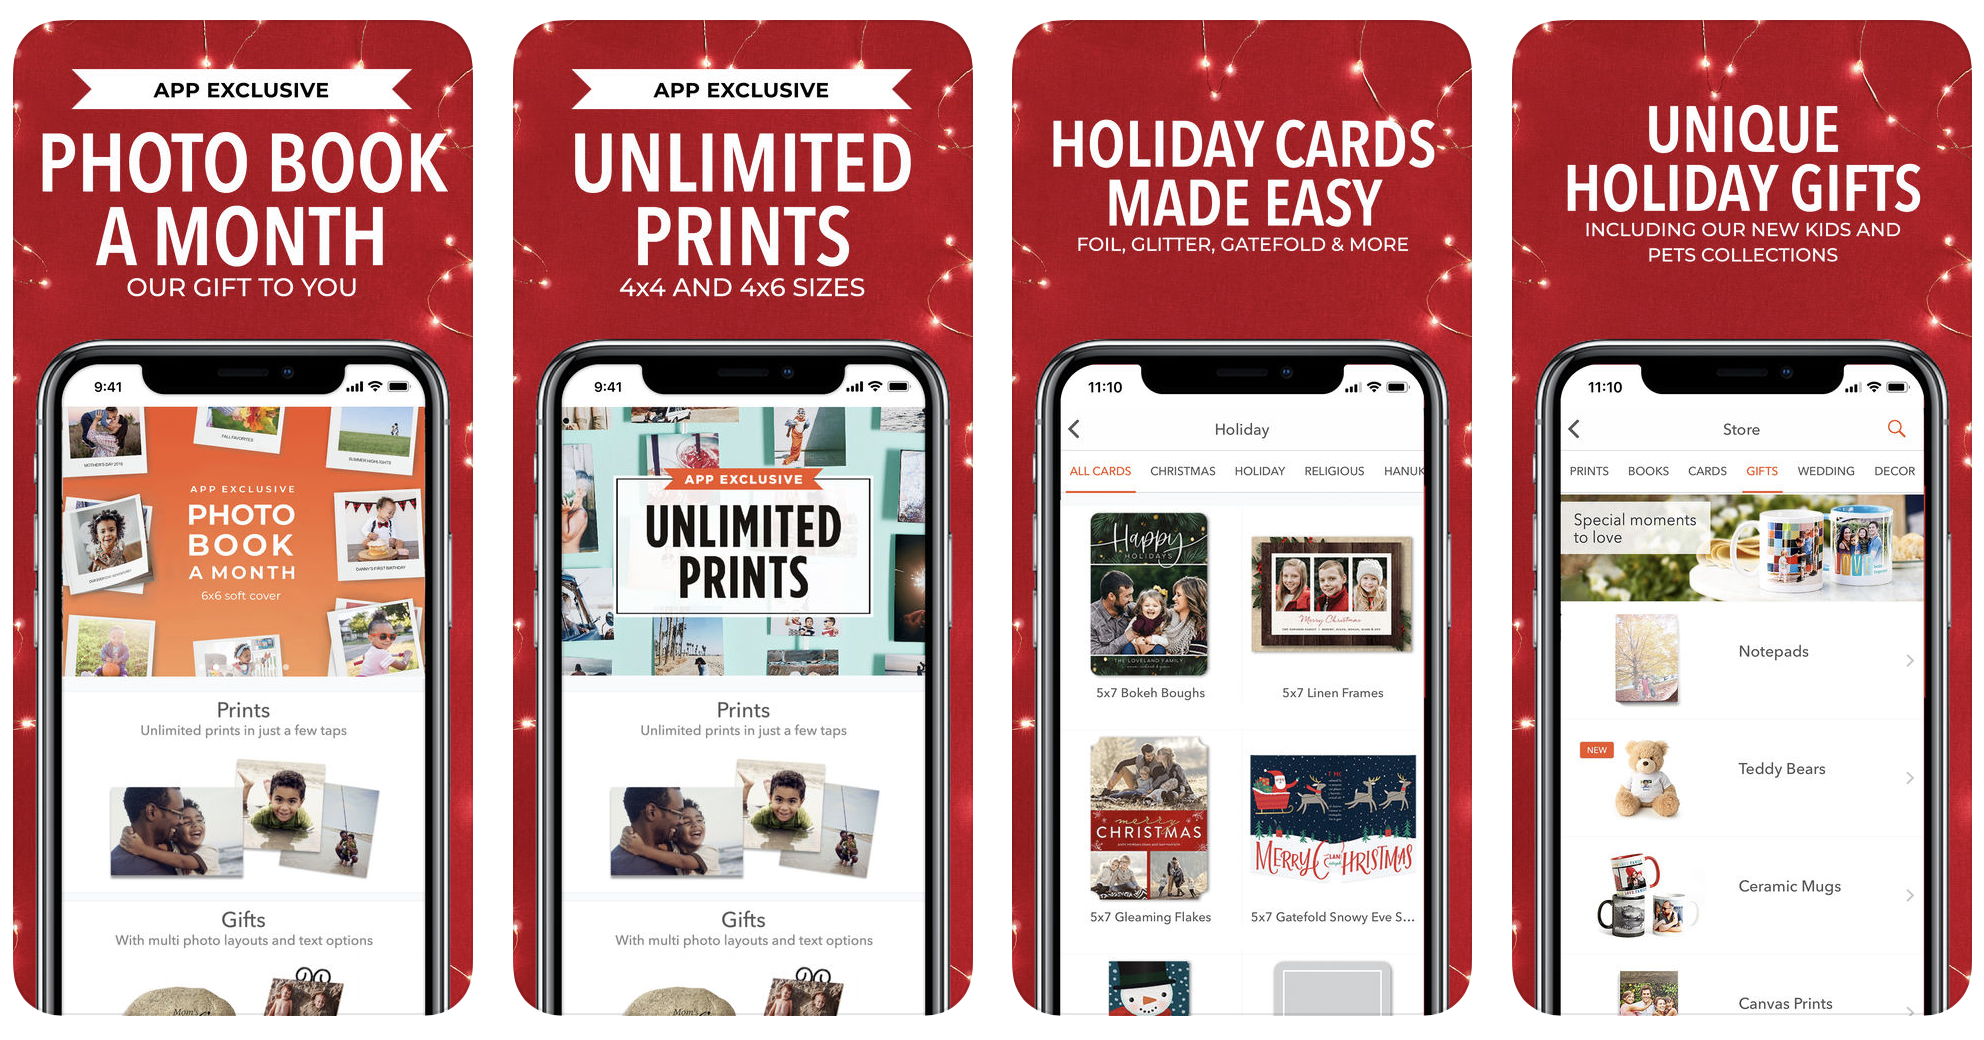 How to use Mac to print photo books, calendars, and more